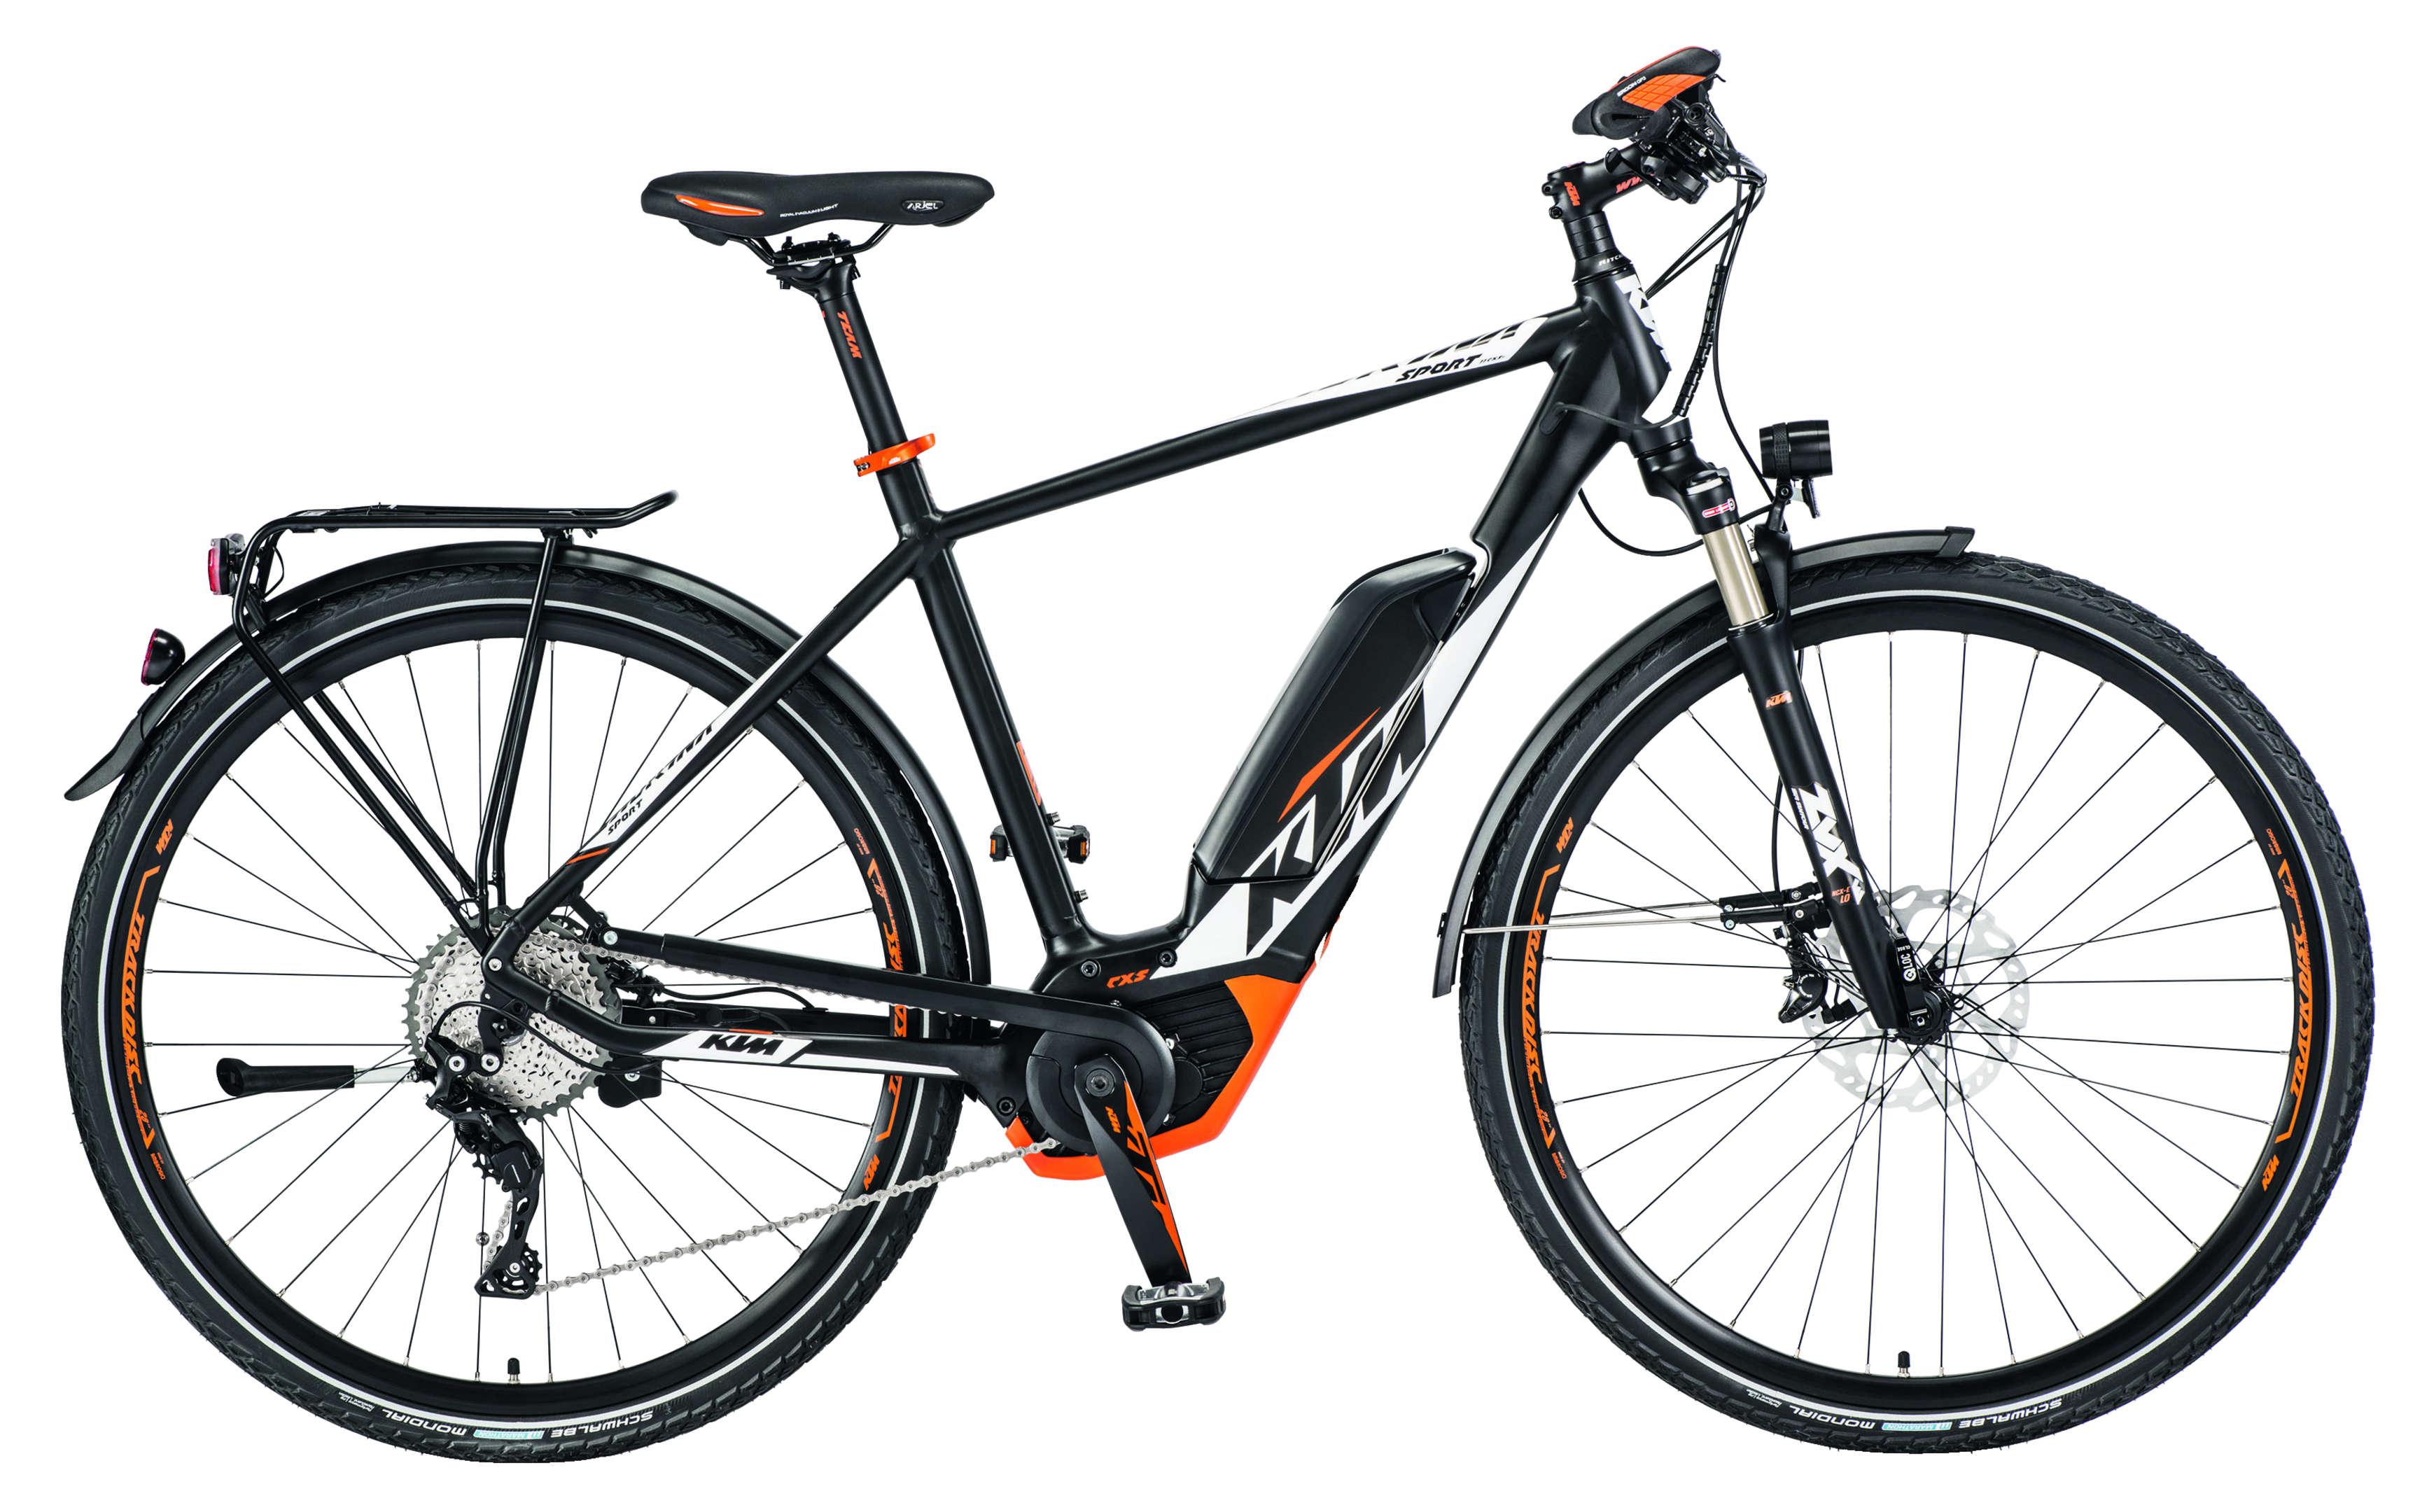 ktm e bike macina sport 11 cx5 eurorad bikeleasingeurorad bikeleasing. Black Bedroom Furniture Sets. Home Design Ideas